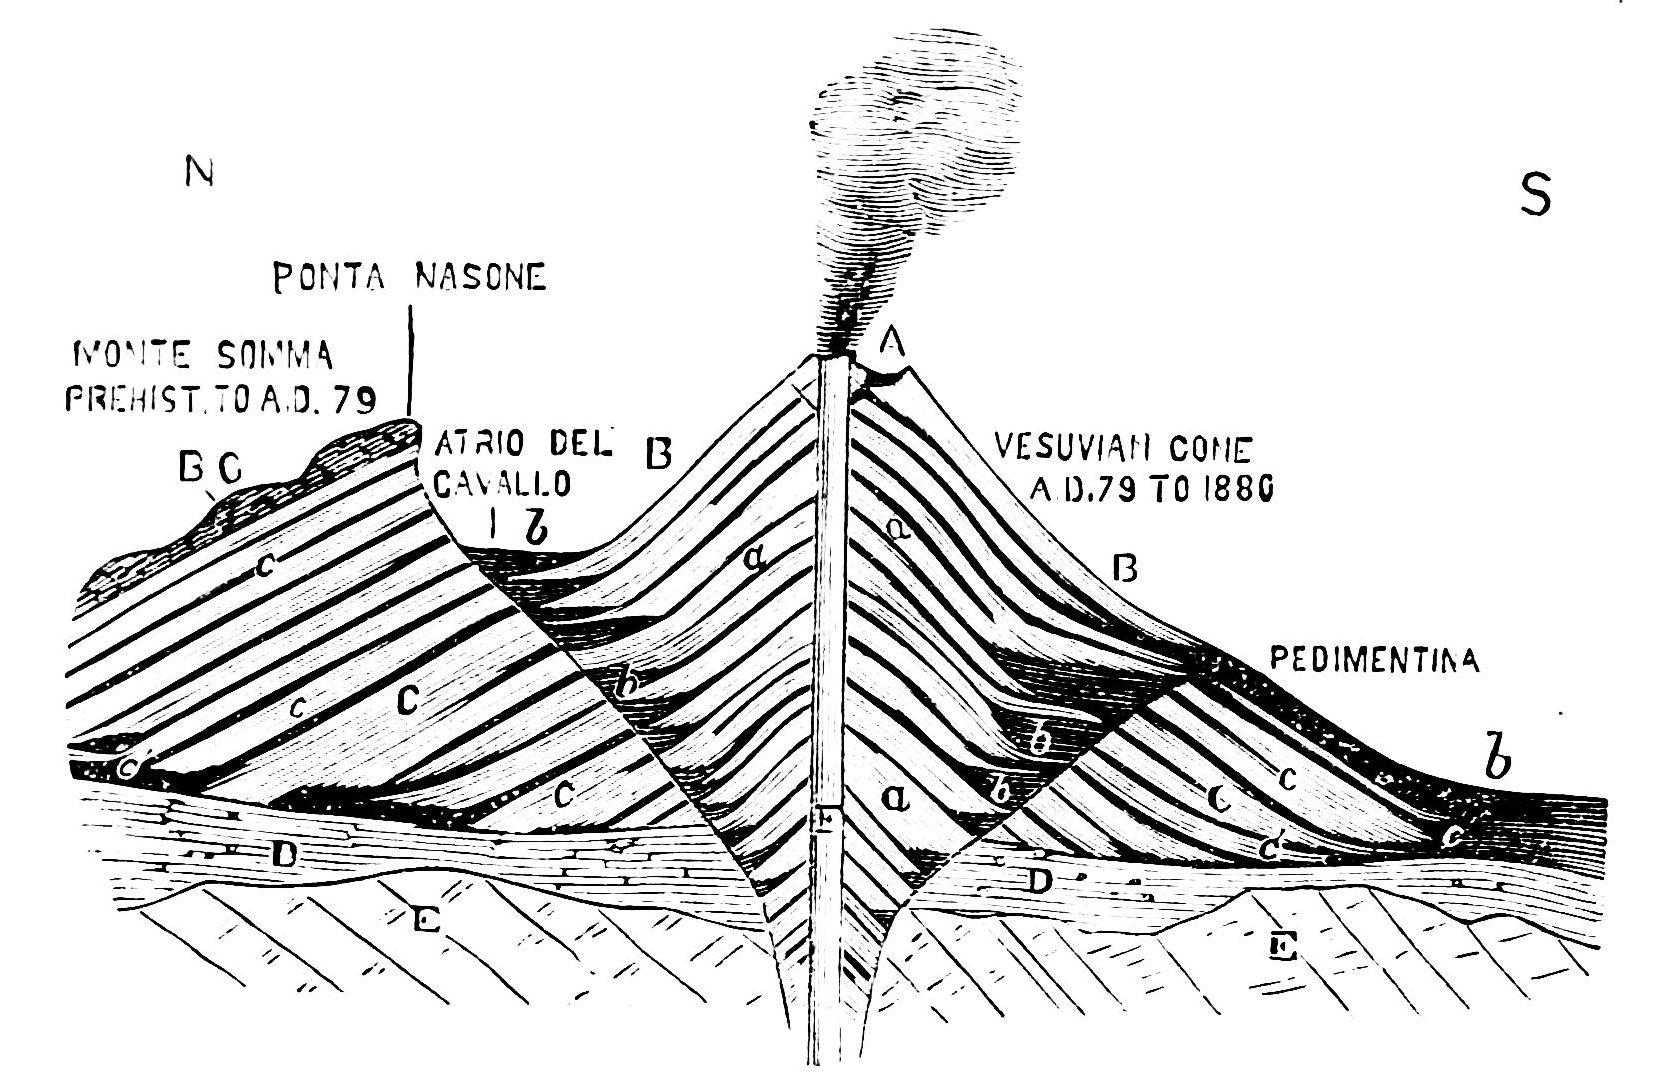 File Psm V19 D060 Cone Of Eruption Over Time Of Vesuvius